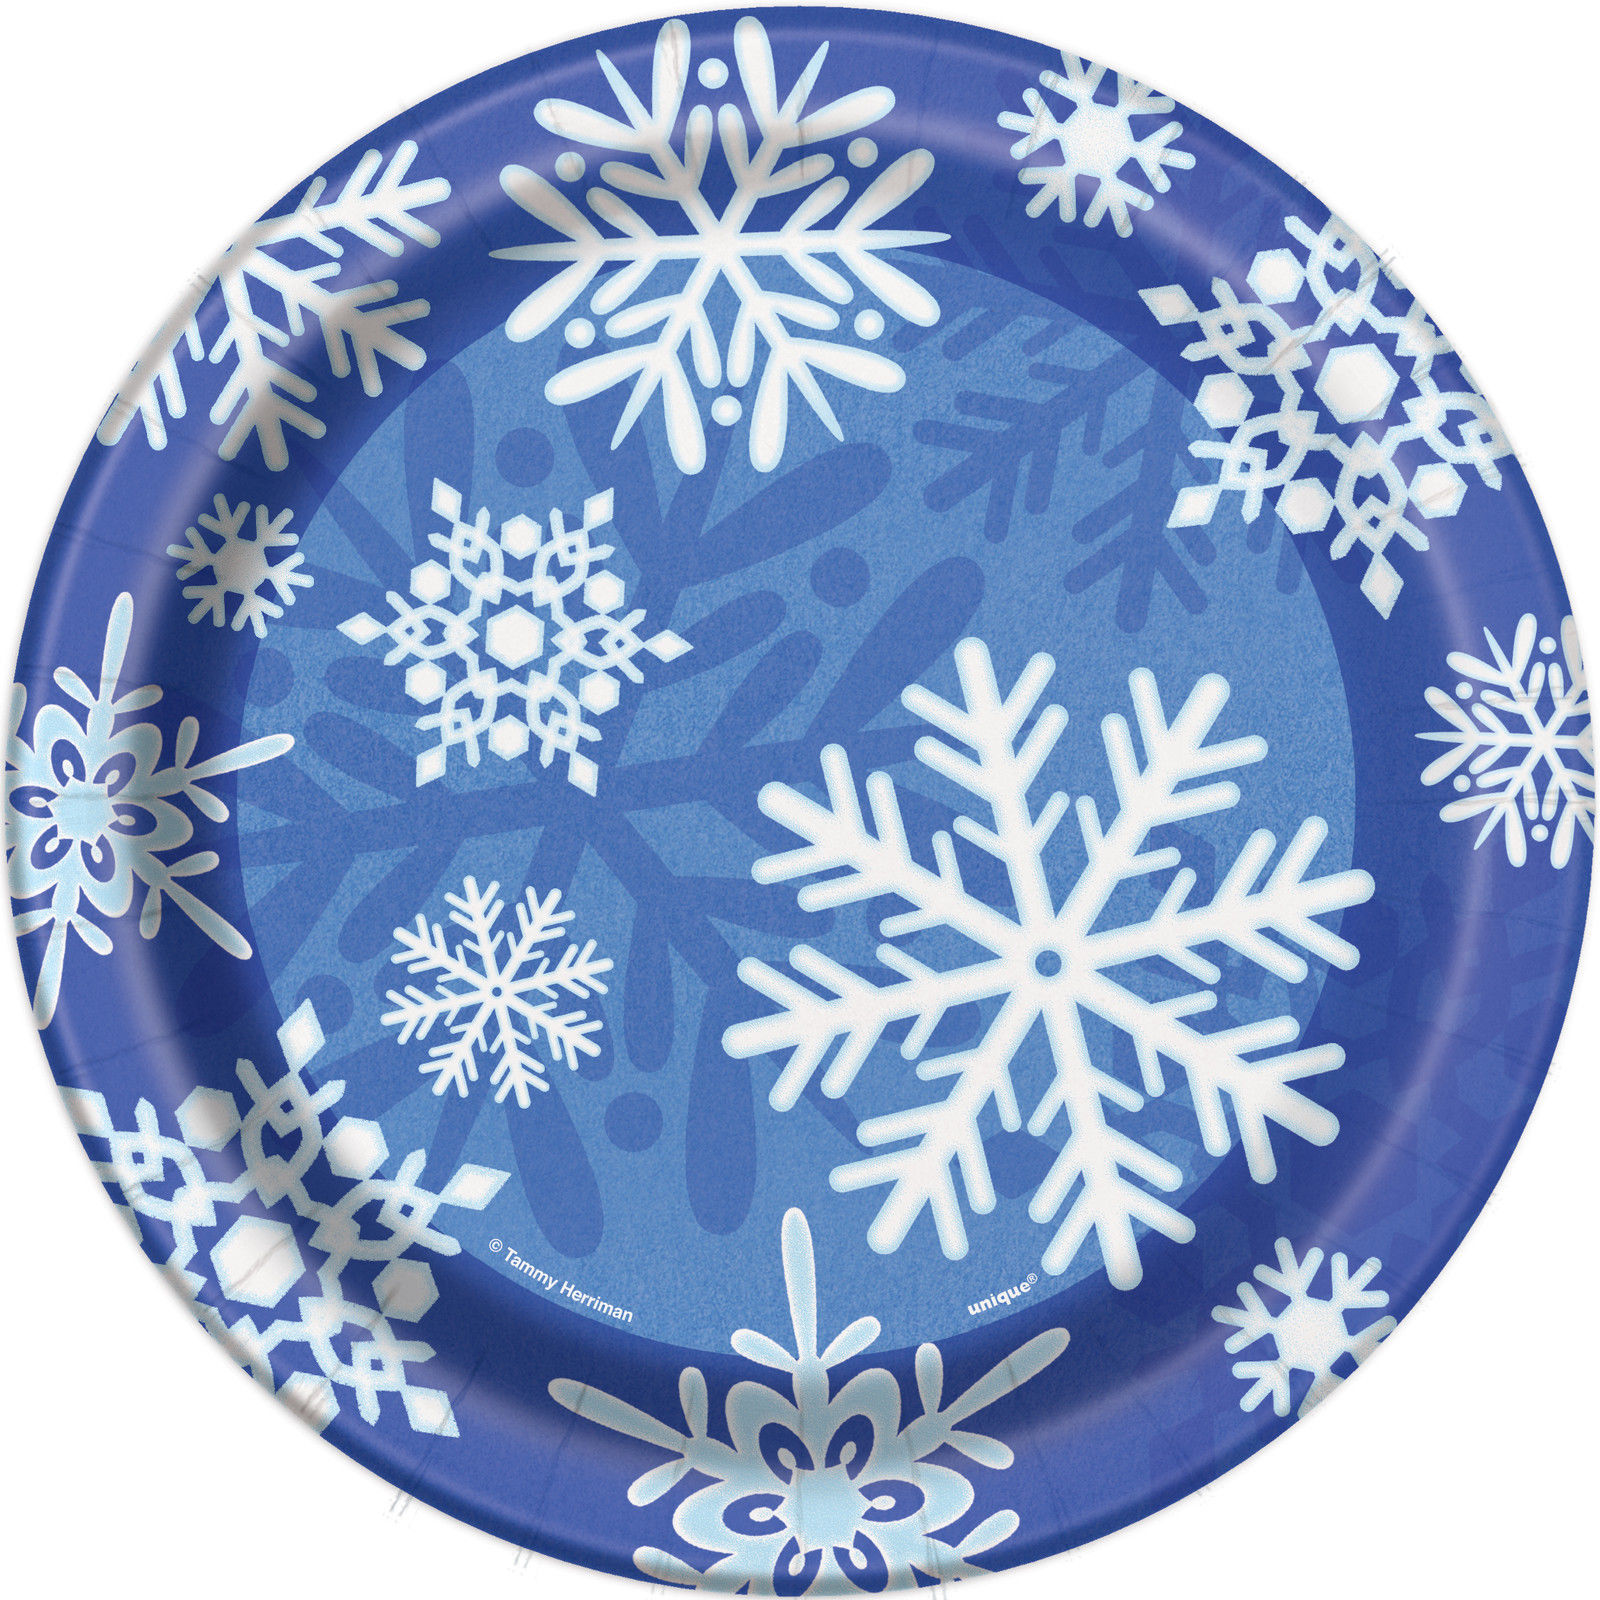 8 x Blue u0026 White Frozen Snowflakes Paper Plates 7  sc 1 st  eBay & 8 x Blue u0026 White Frozen Snowflakes Paper Plates 7